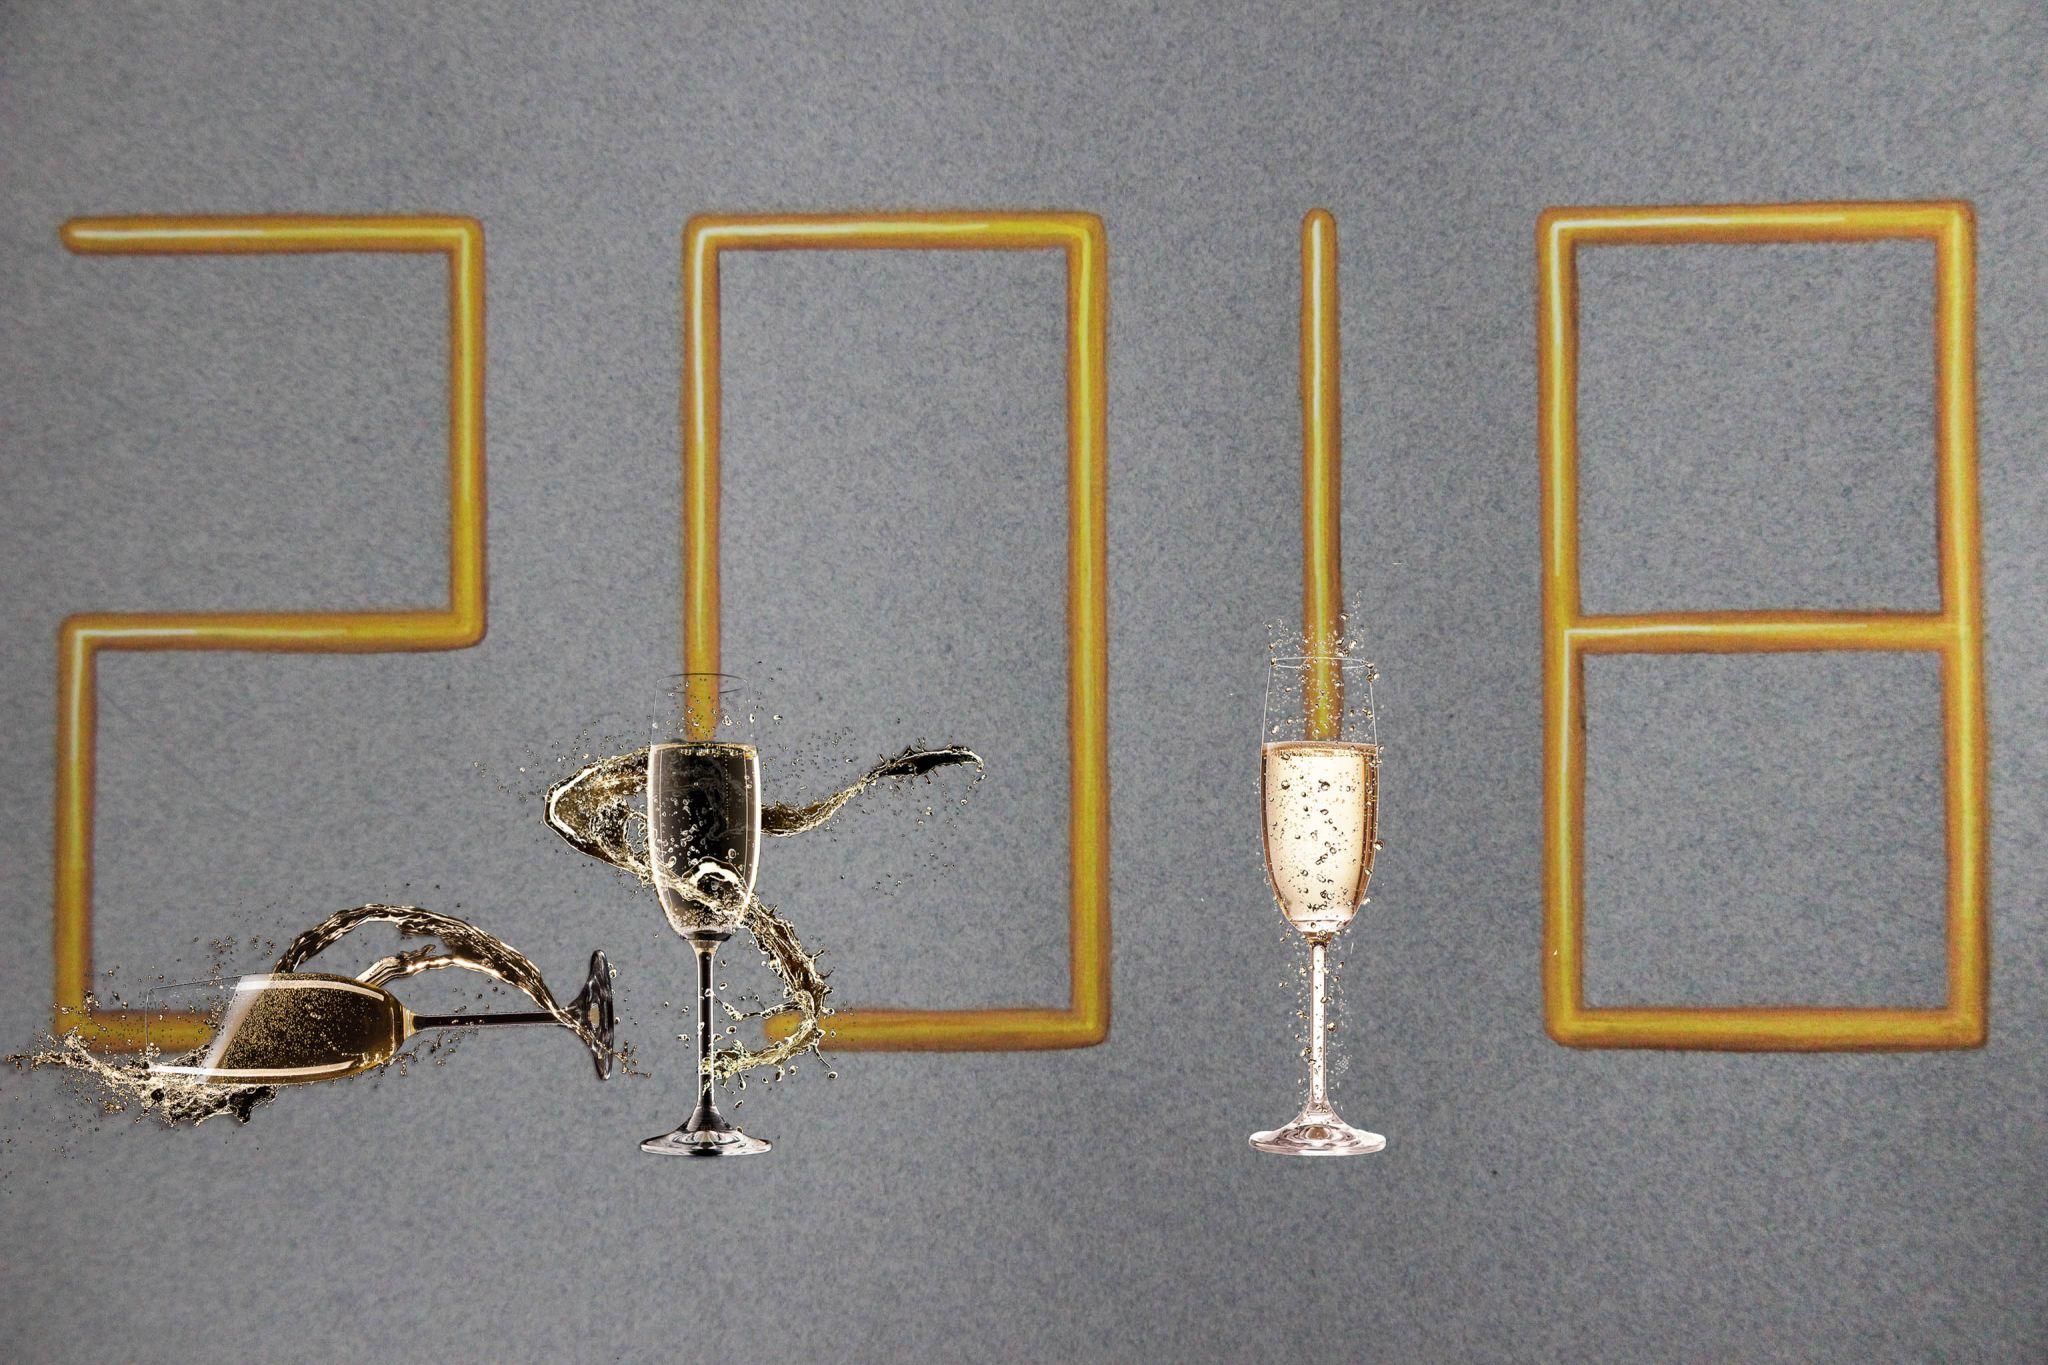 celebrations happy new year 2018